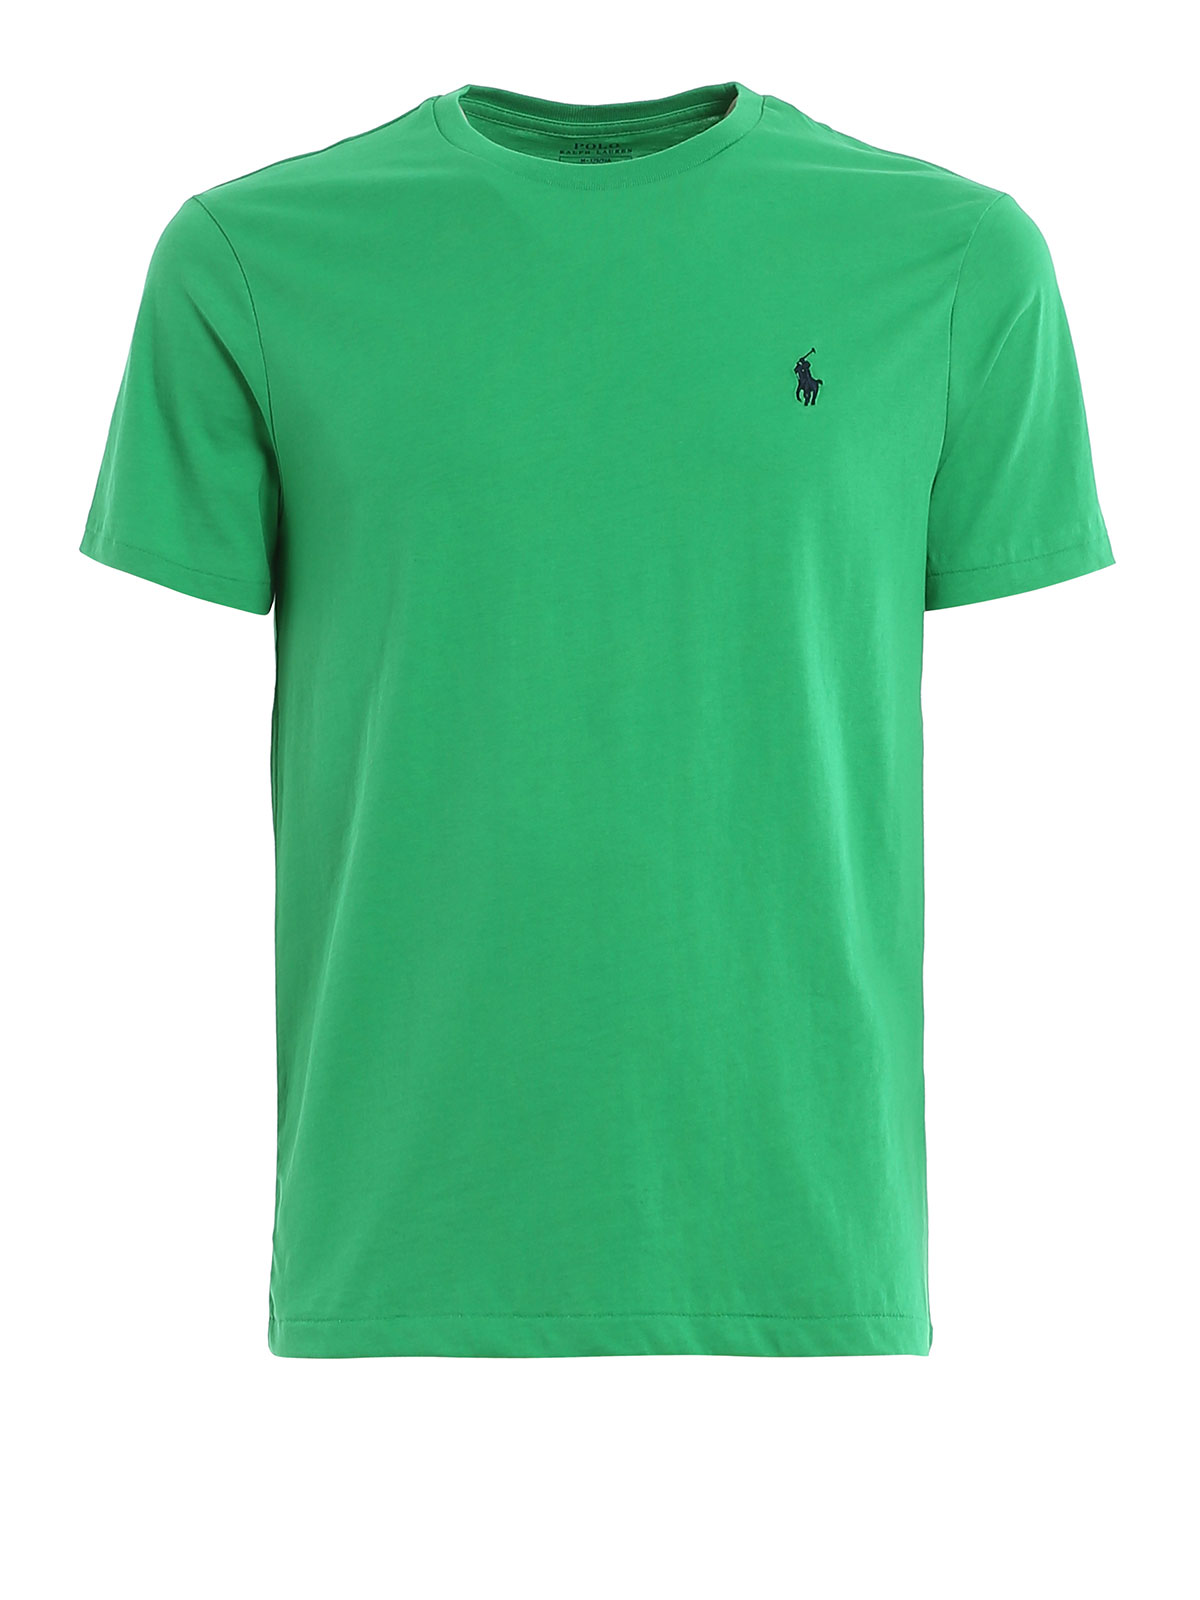 Immagine di POLO RALPH LAUREN | T-Shirt Uomo Custom Fit